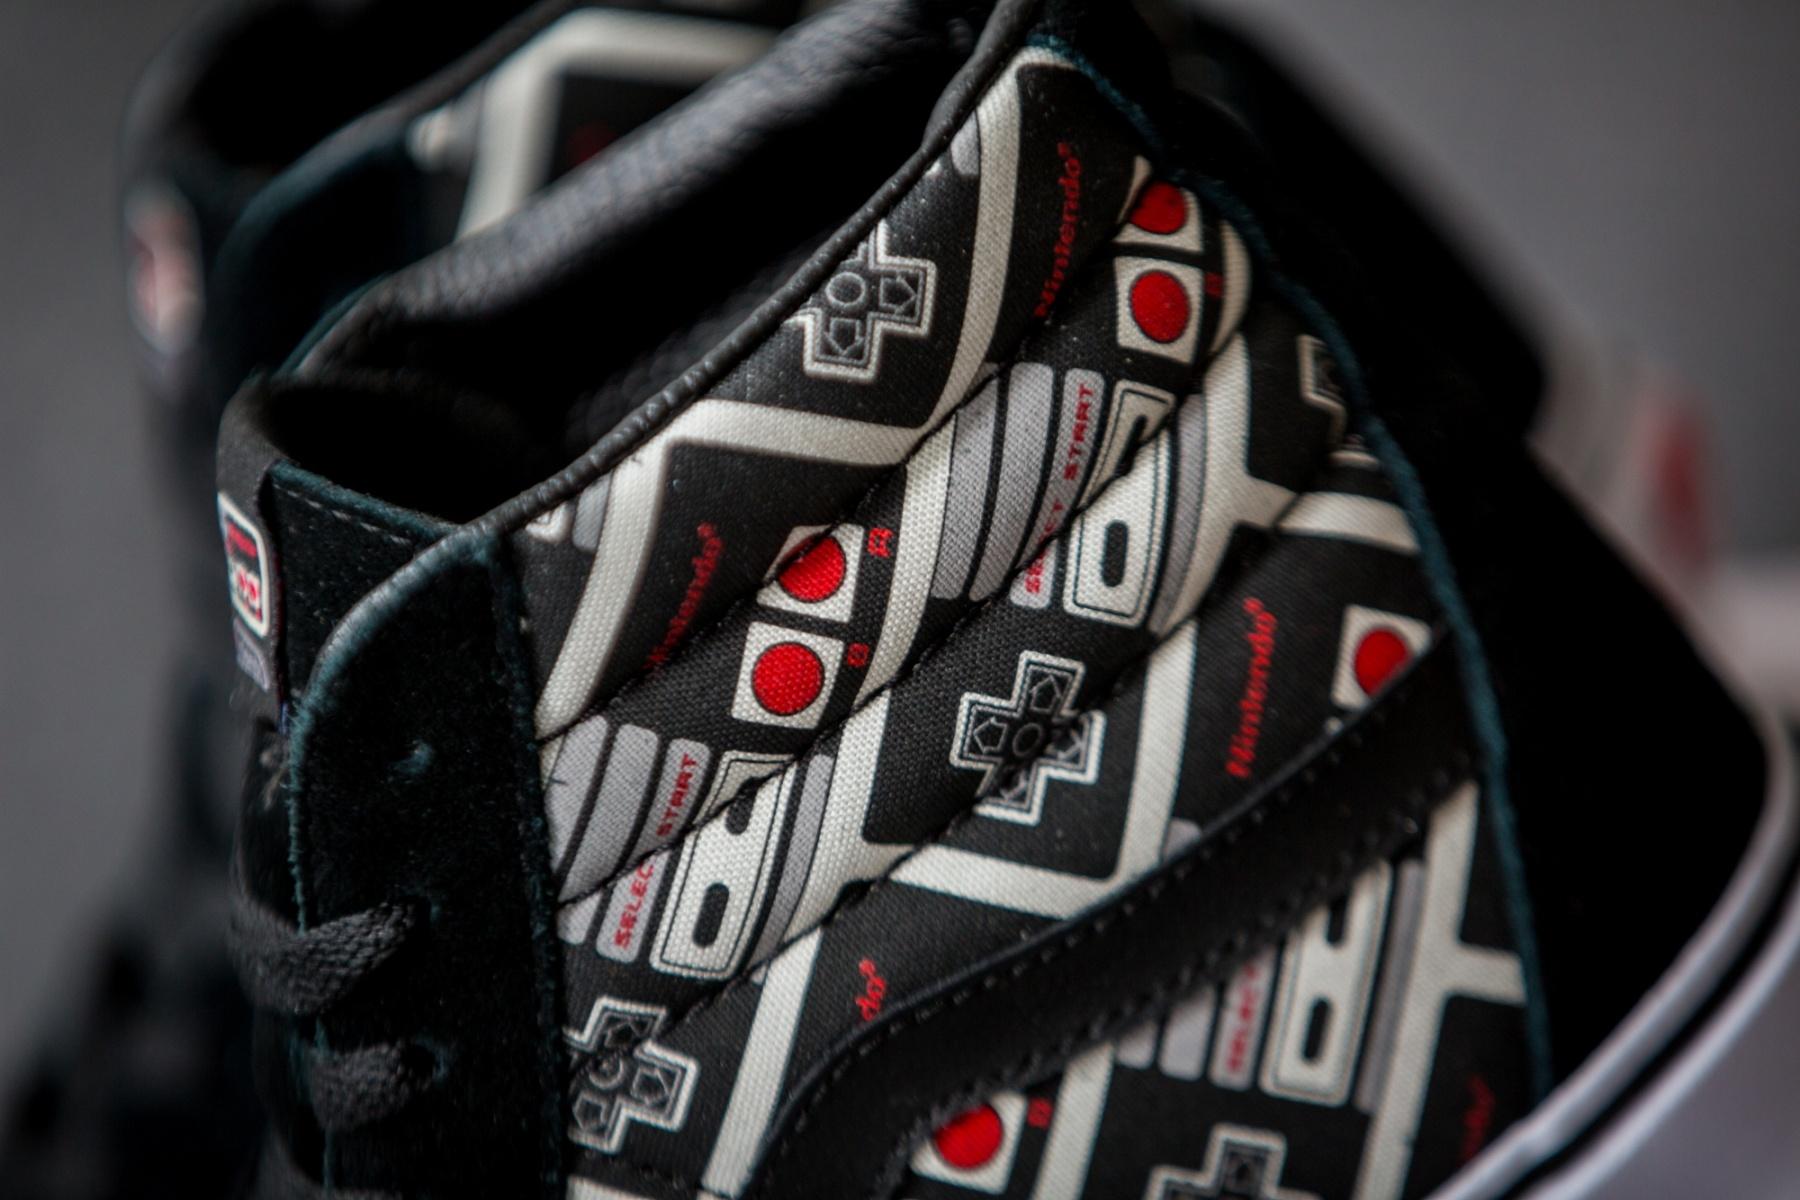 Chaussure Nintendo x Vans SK8 Hi Reissue manette Nes 8 Bits (3)